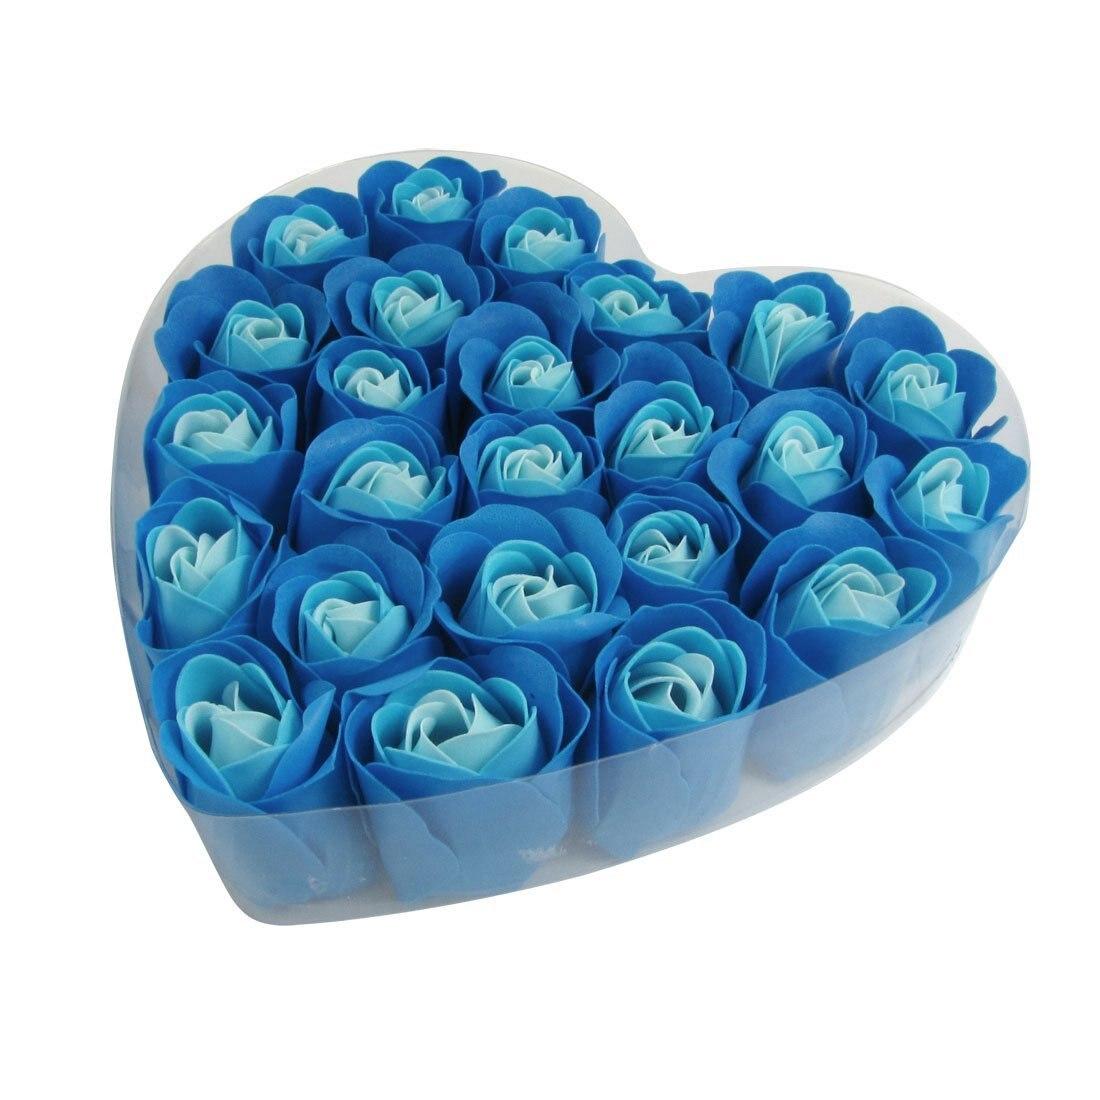 24 Pcs Blue Scented Bath Soap Rose Petal In Heart Box